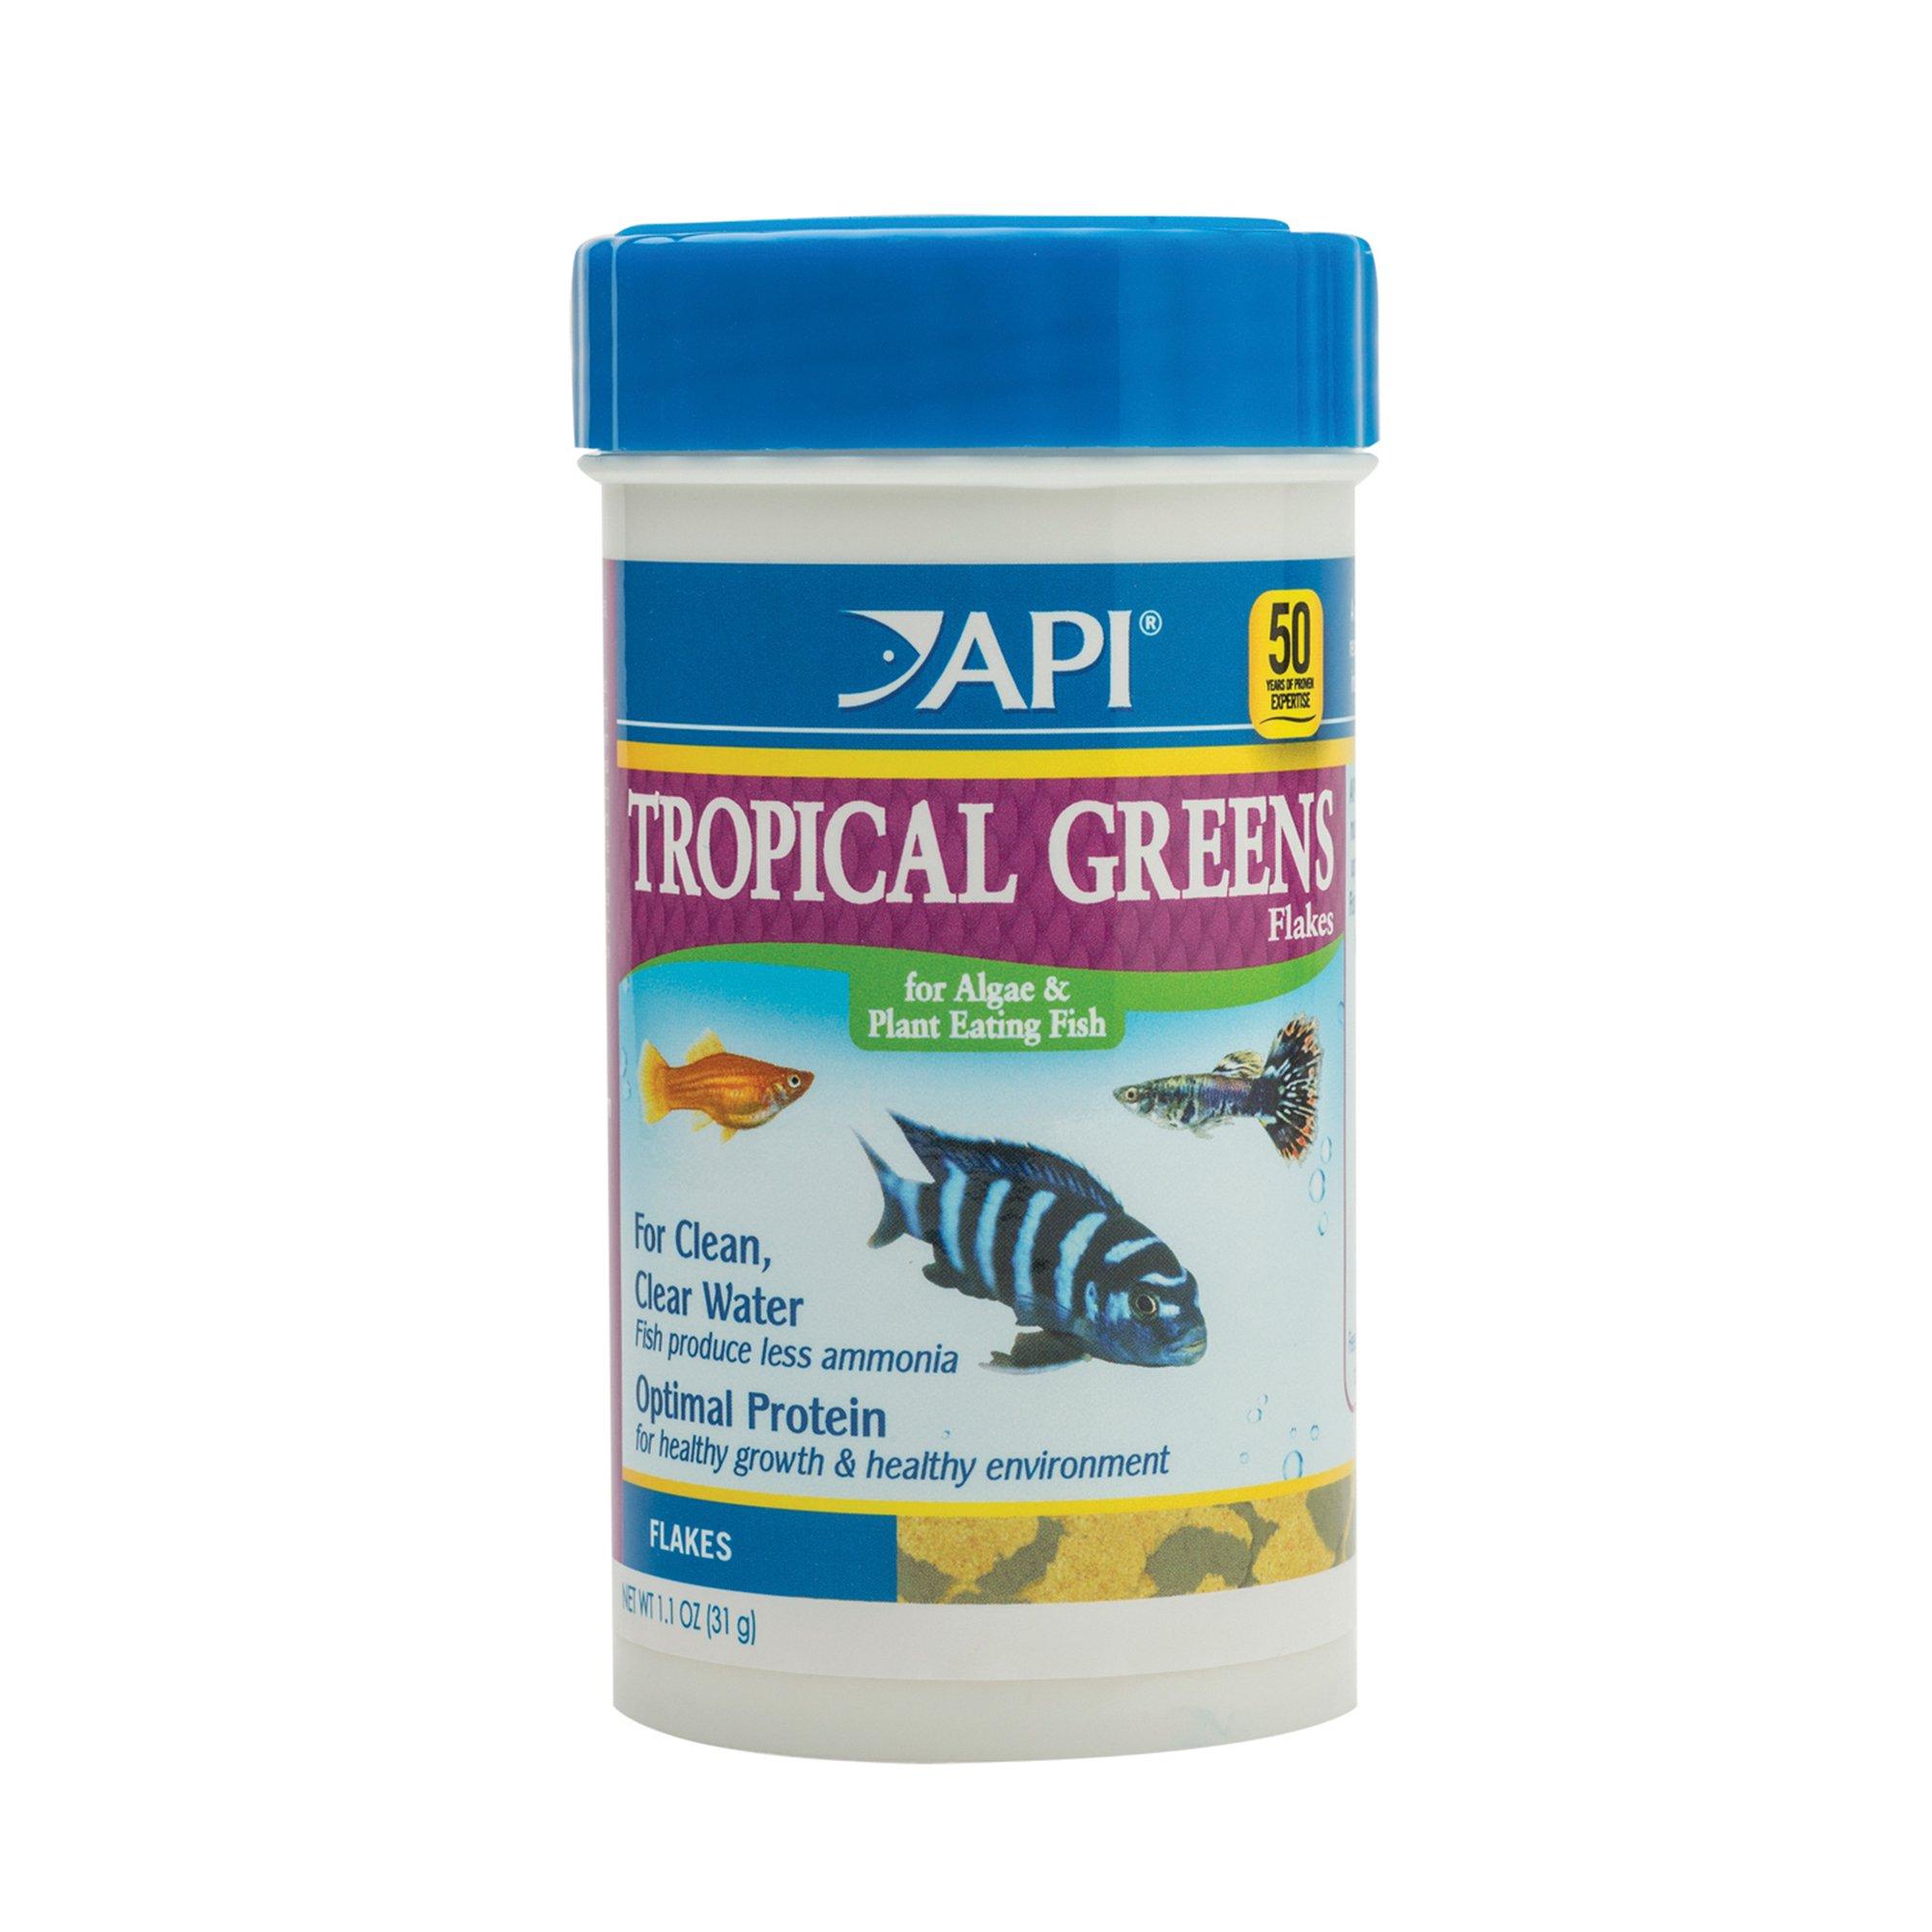 Api tropical greens flakes tropical fish greens flakes for Petco fish food